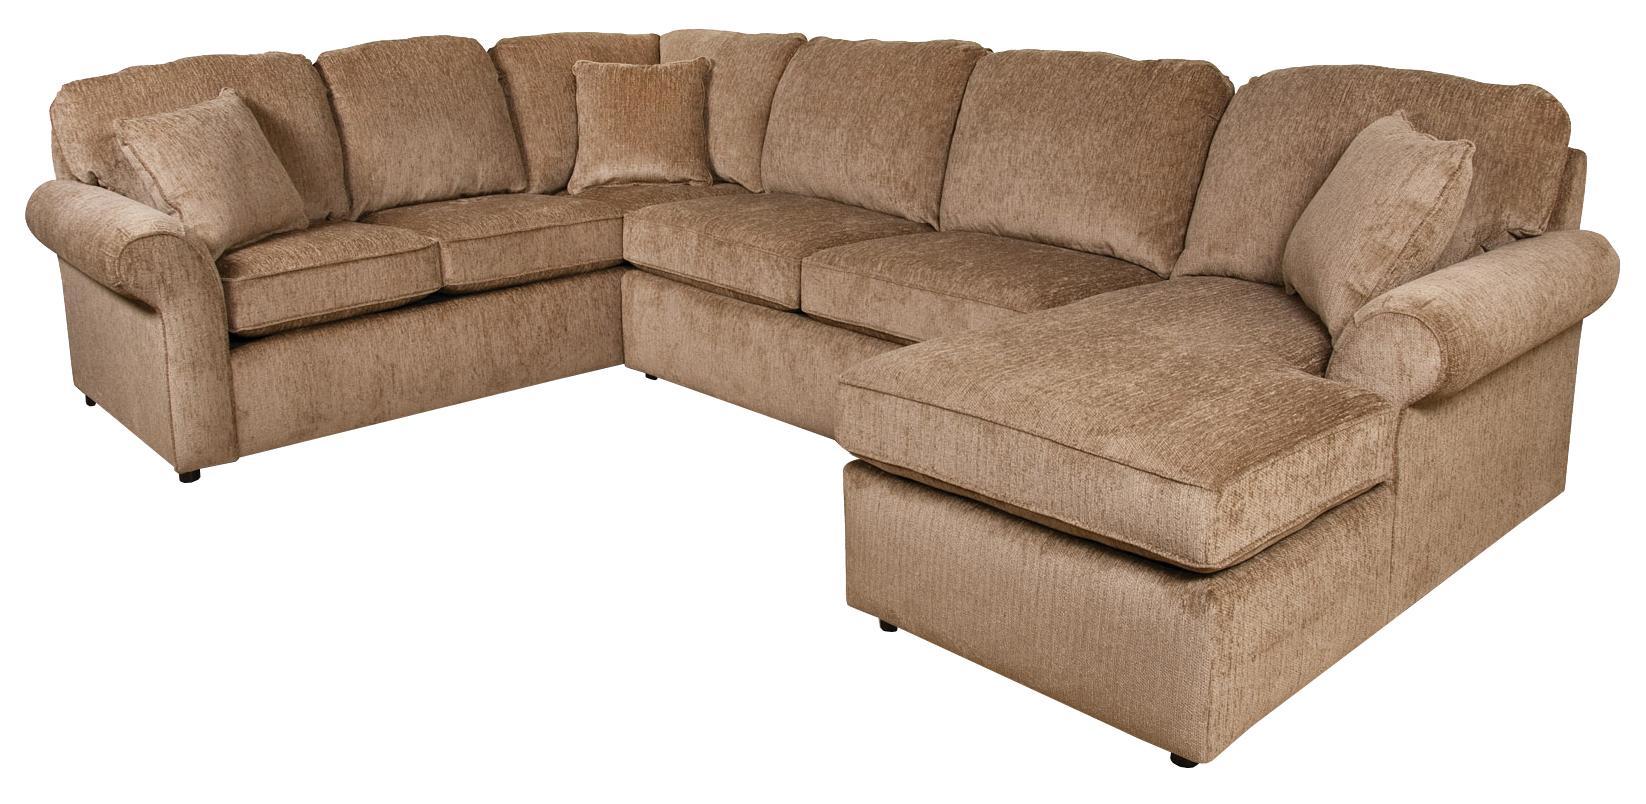 England Malibu 5 6 Seat Right Side Chaise Sectional Sofa